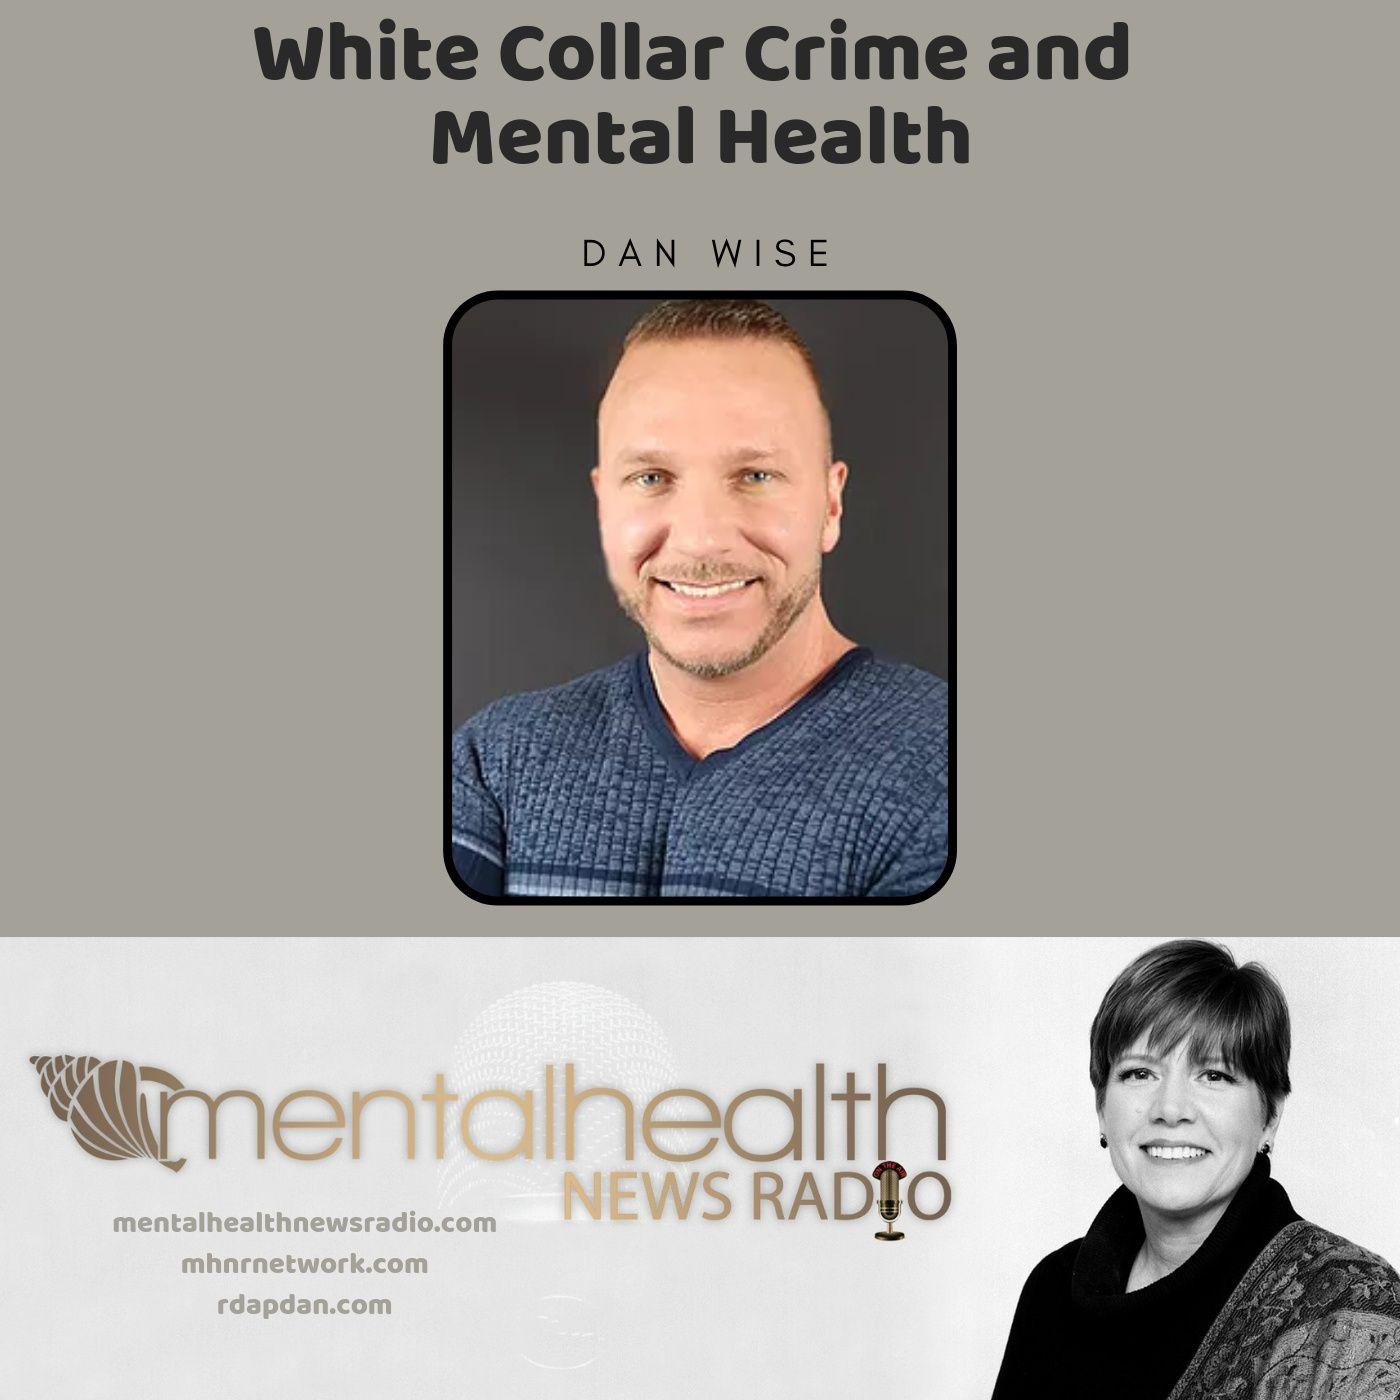 Mental Health News Radio - White Collar Crime and Mental Health